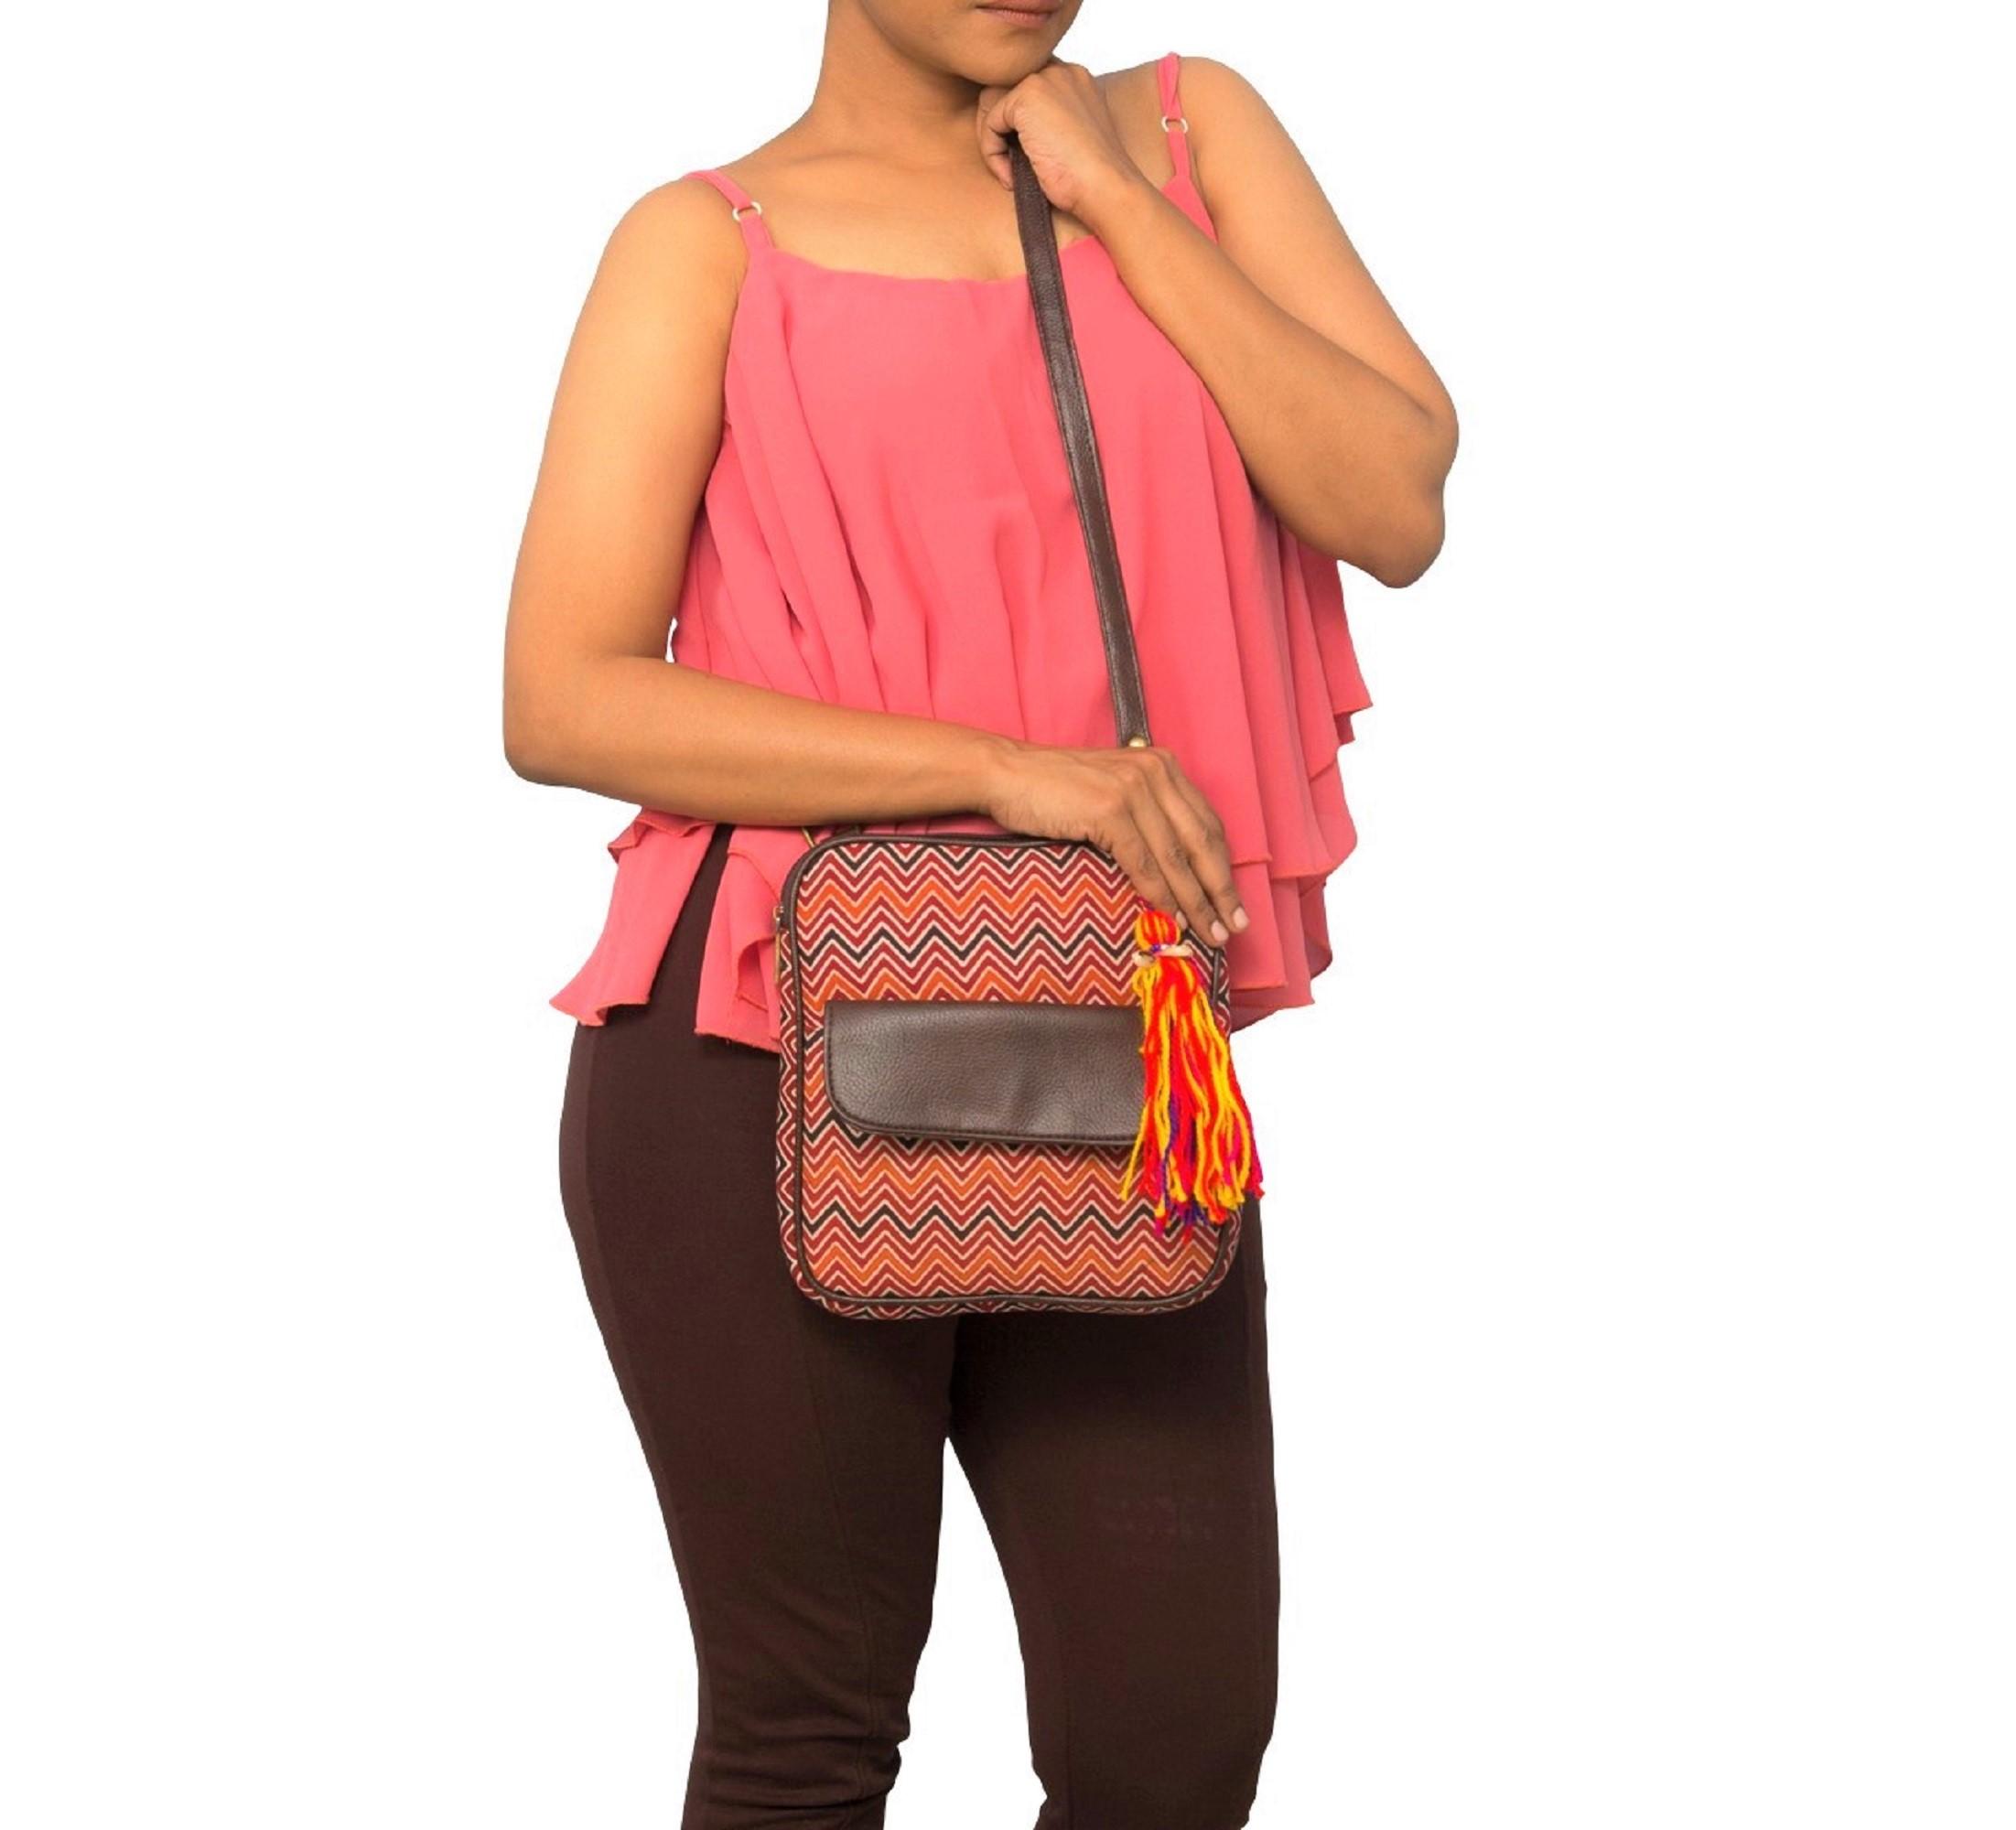 Vivinkaa | Vivinkaa ethnic faux leather cotton orange rainbow flap pocket sling bag